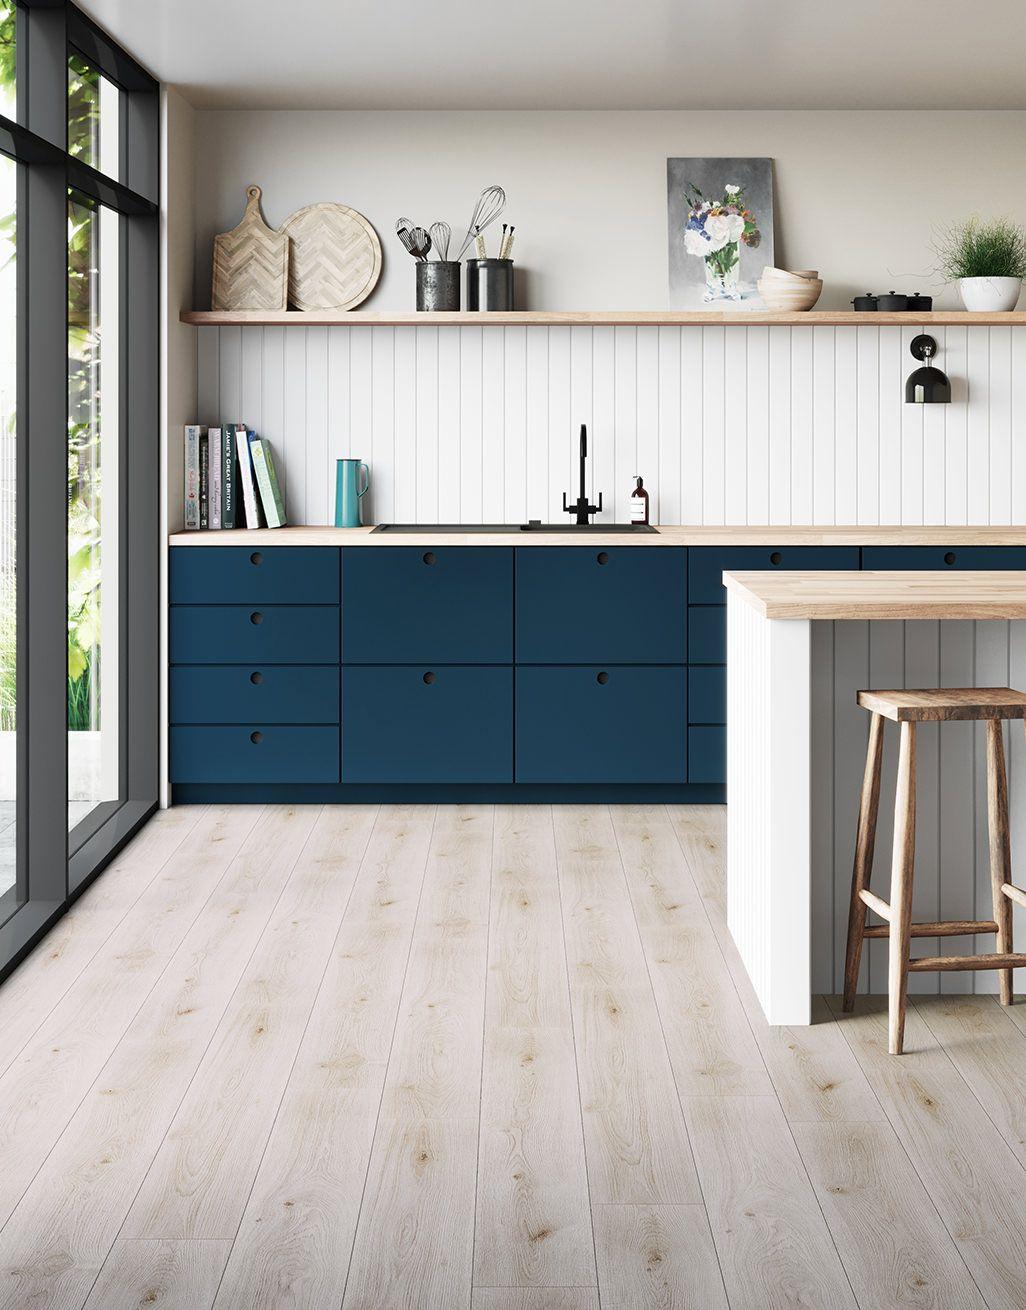 Farmhouse White Laminate Flooring, Laminate Wood Flooring Kitchen